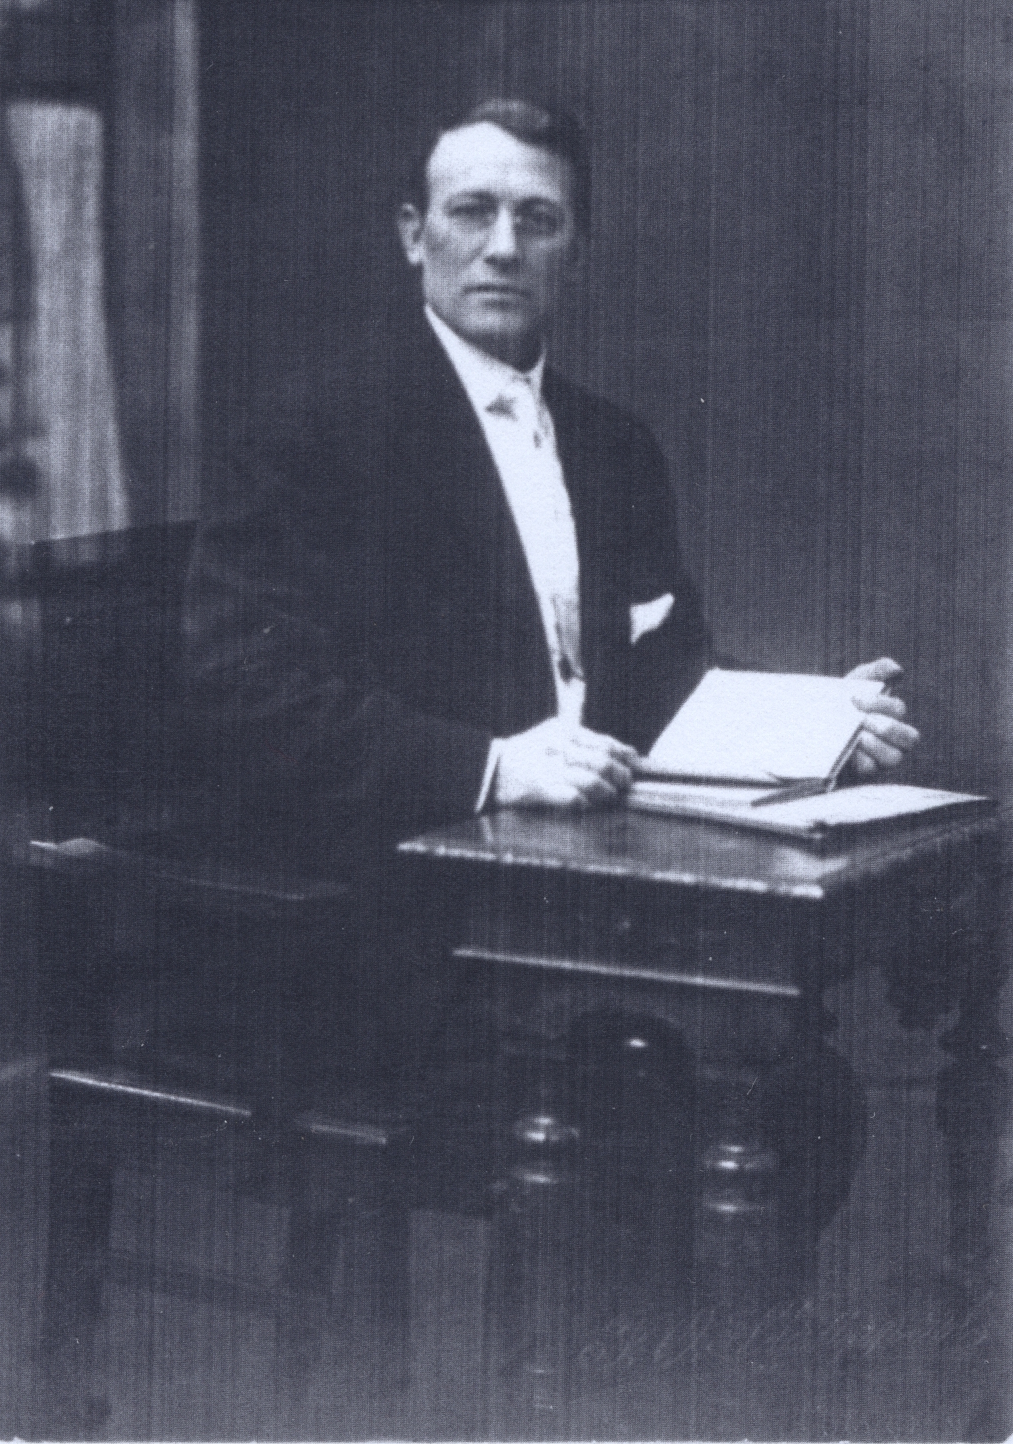 Dalebout, William